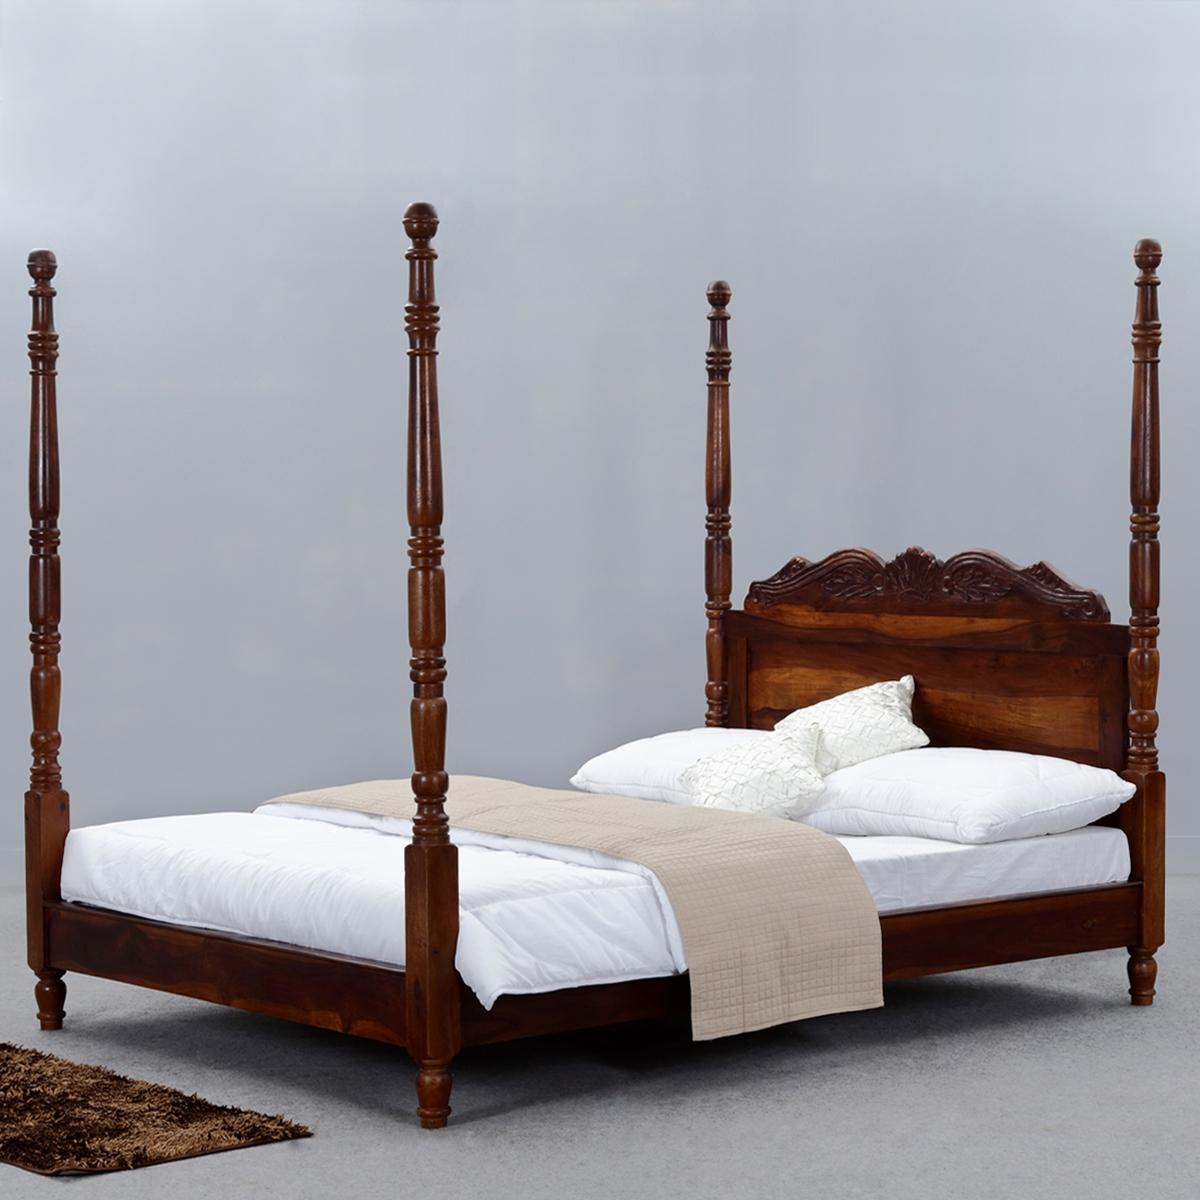 Queen Anne Solid Wood 4 Poster Platform Bed Frame W Headboard